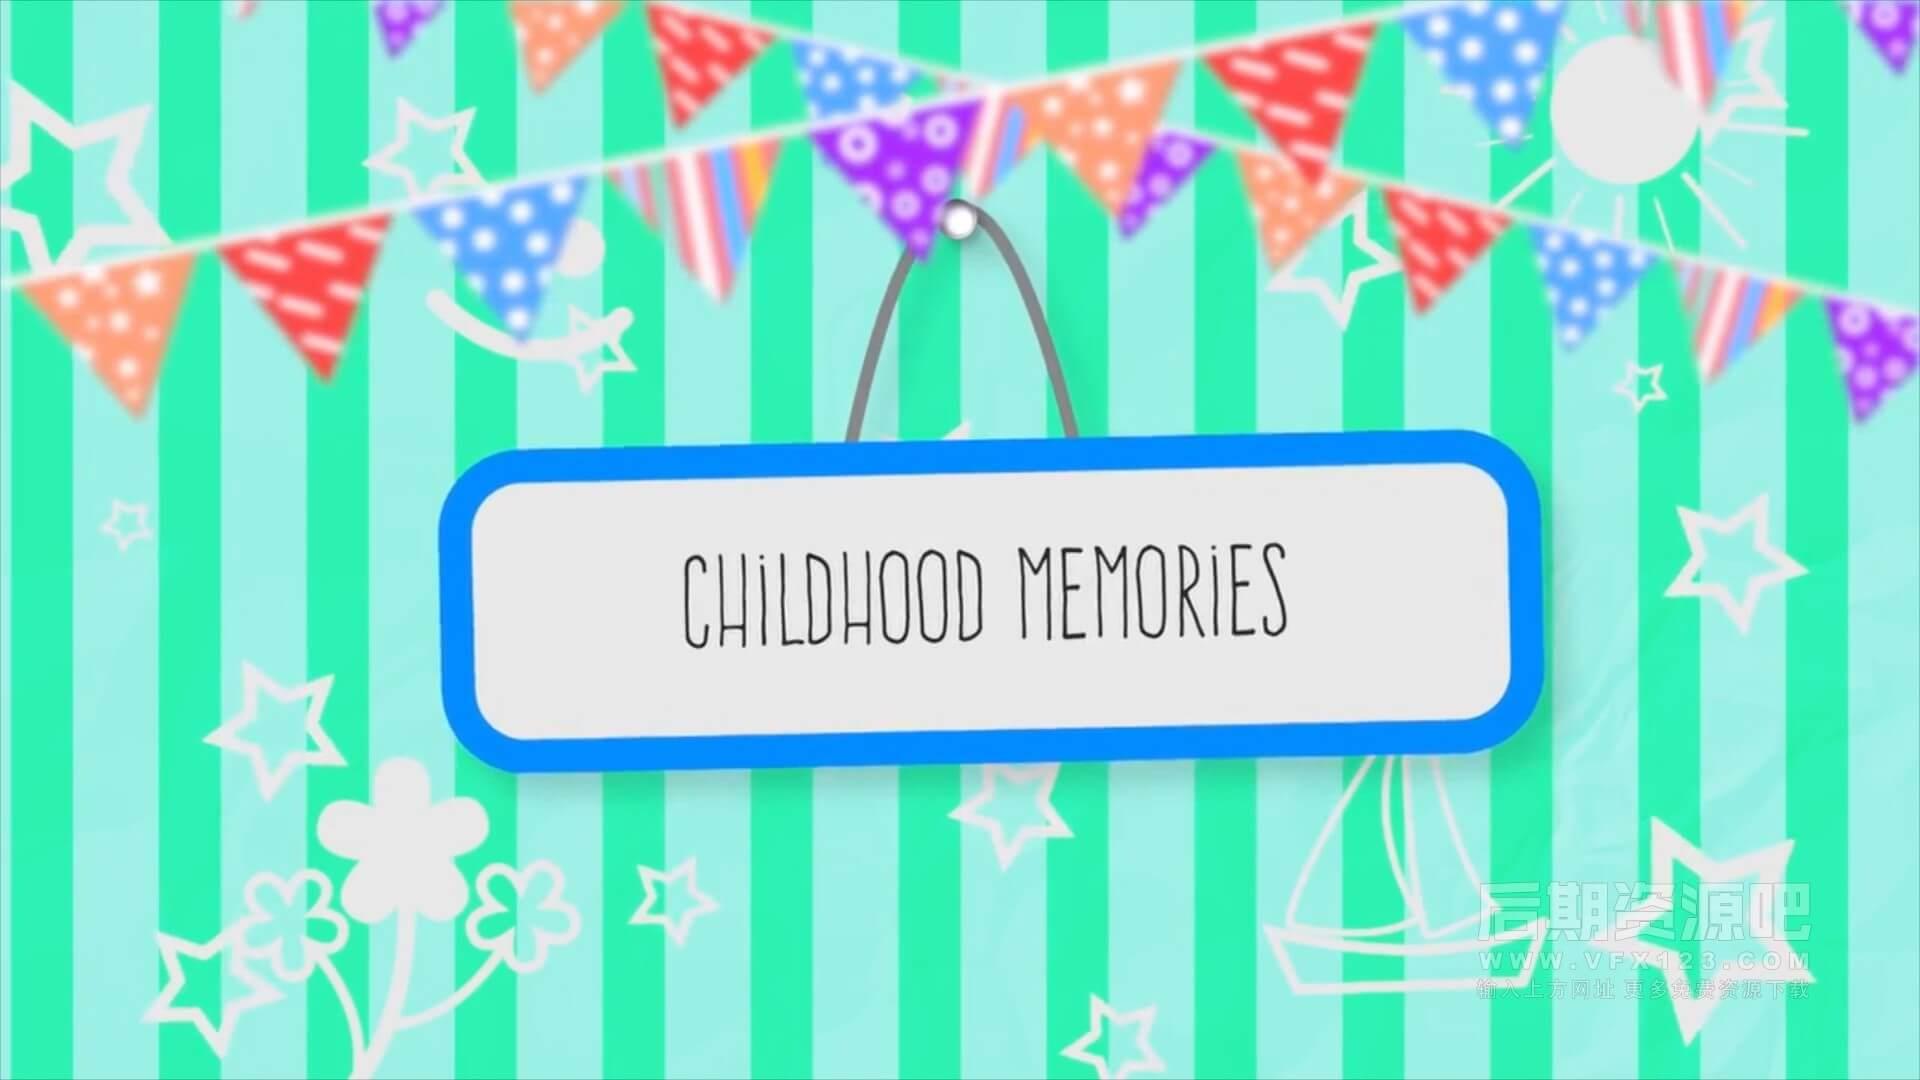 Fcpx主题模板 童年记忆六一儿童节聚会照片视频展示 Childhood Memories